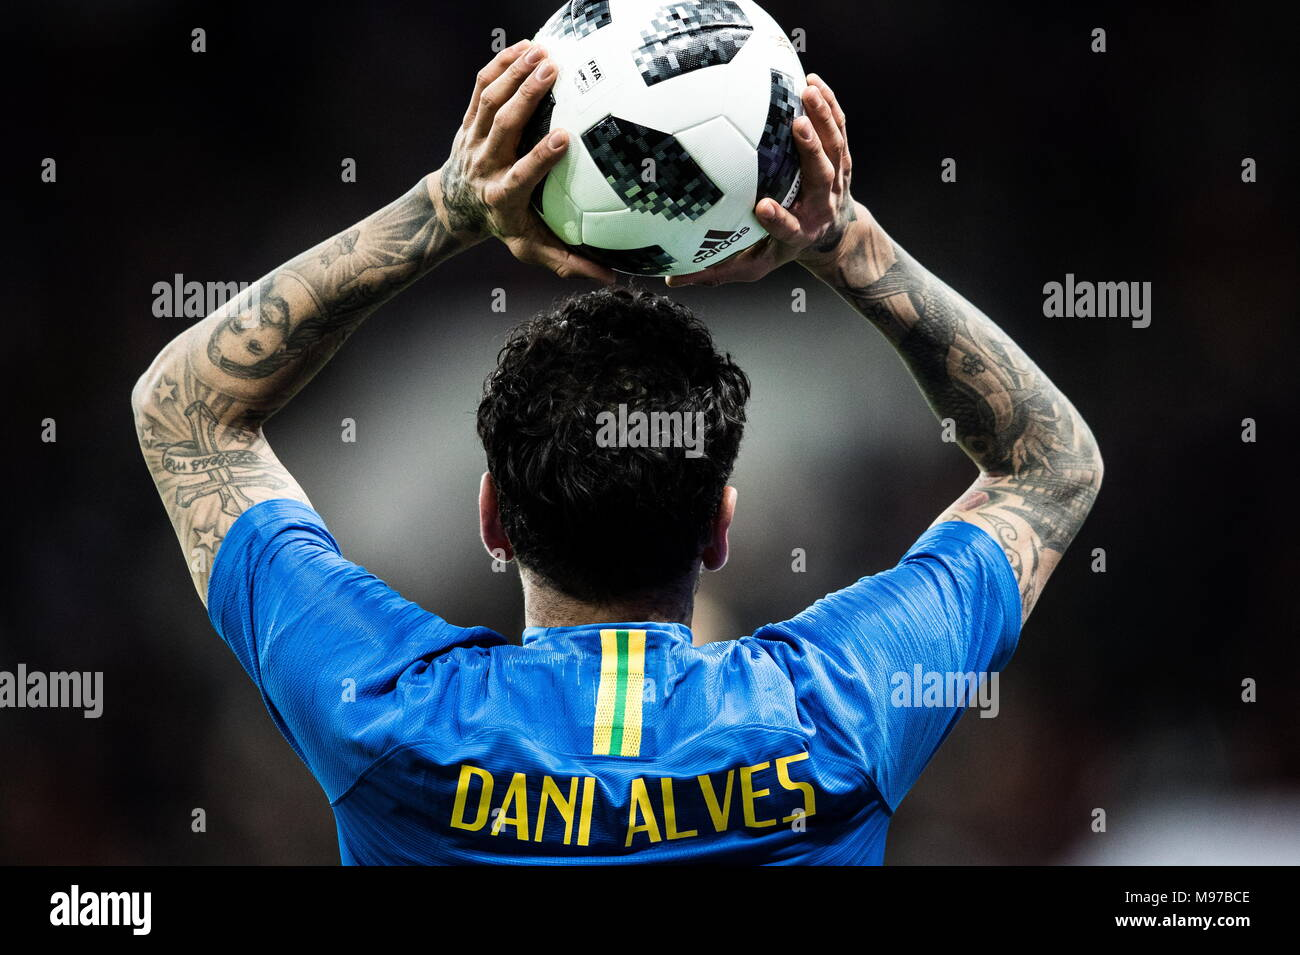 ec540d39142 Brazilian Dani Alves Stock Photos   Brazilian Dani Alves Stock ...